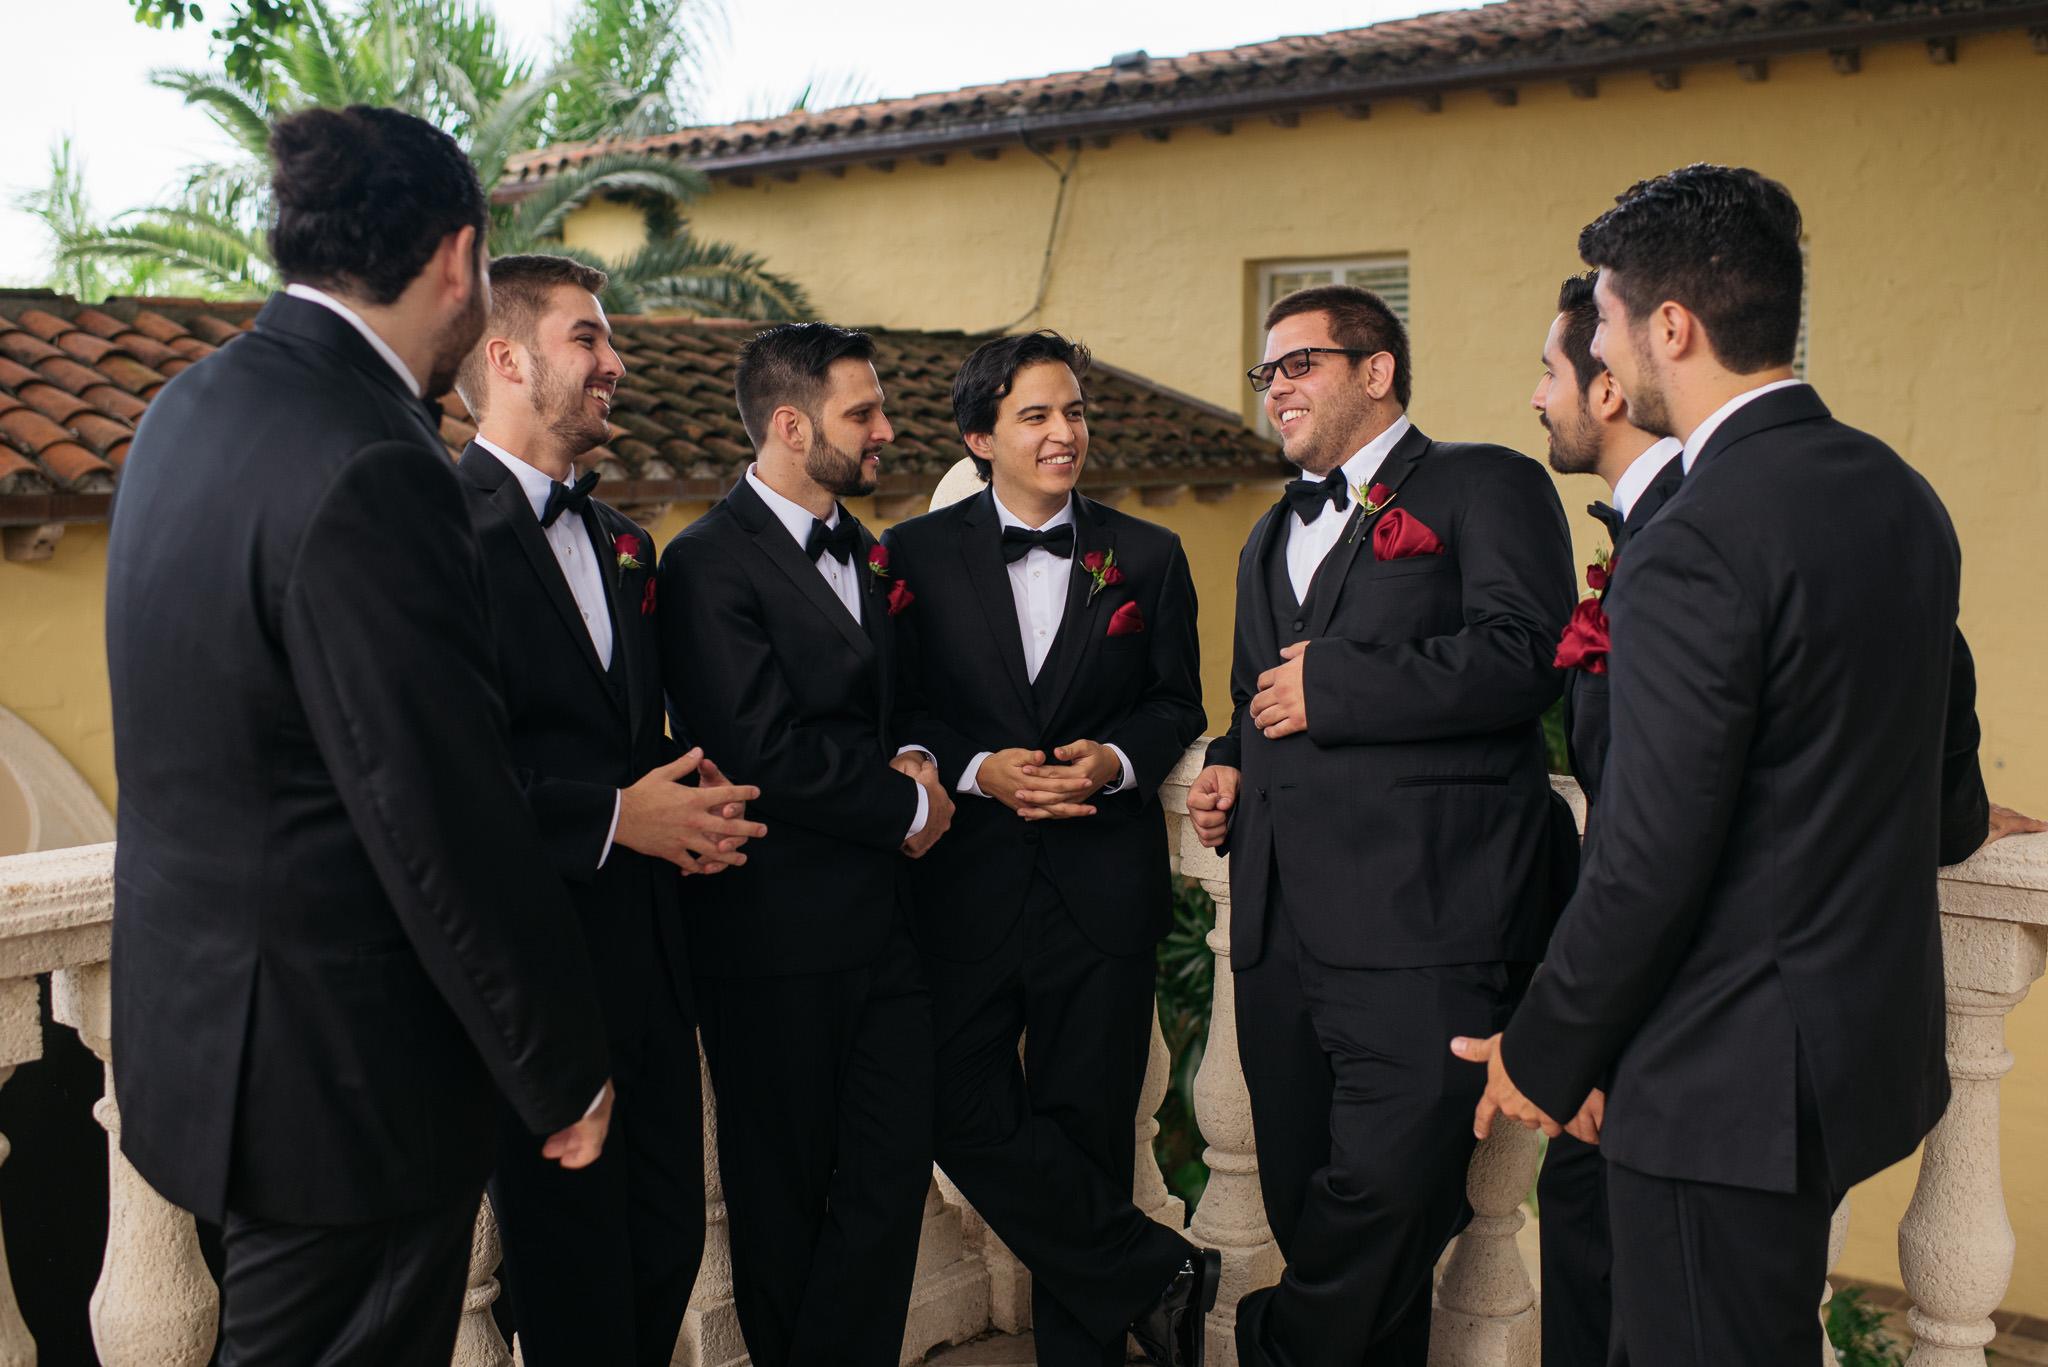 Sam+Ricardo_Wisconsin_Wedding_photographer-21.jpg